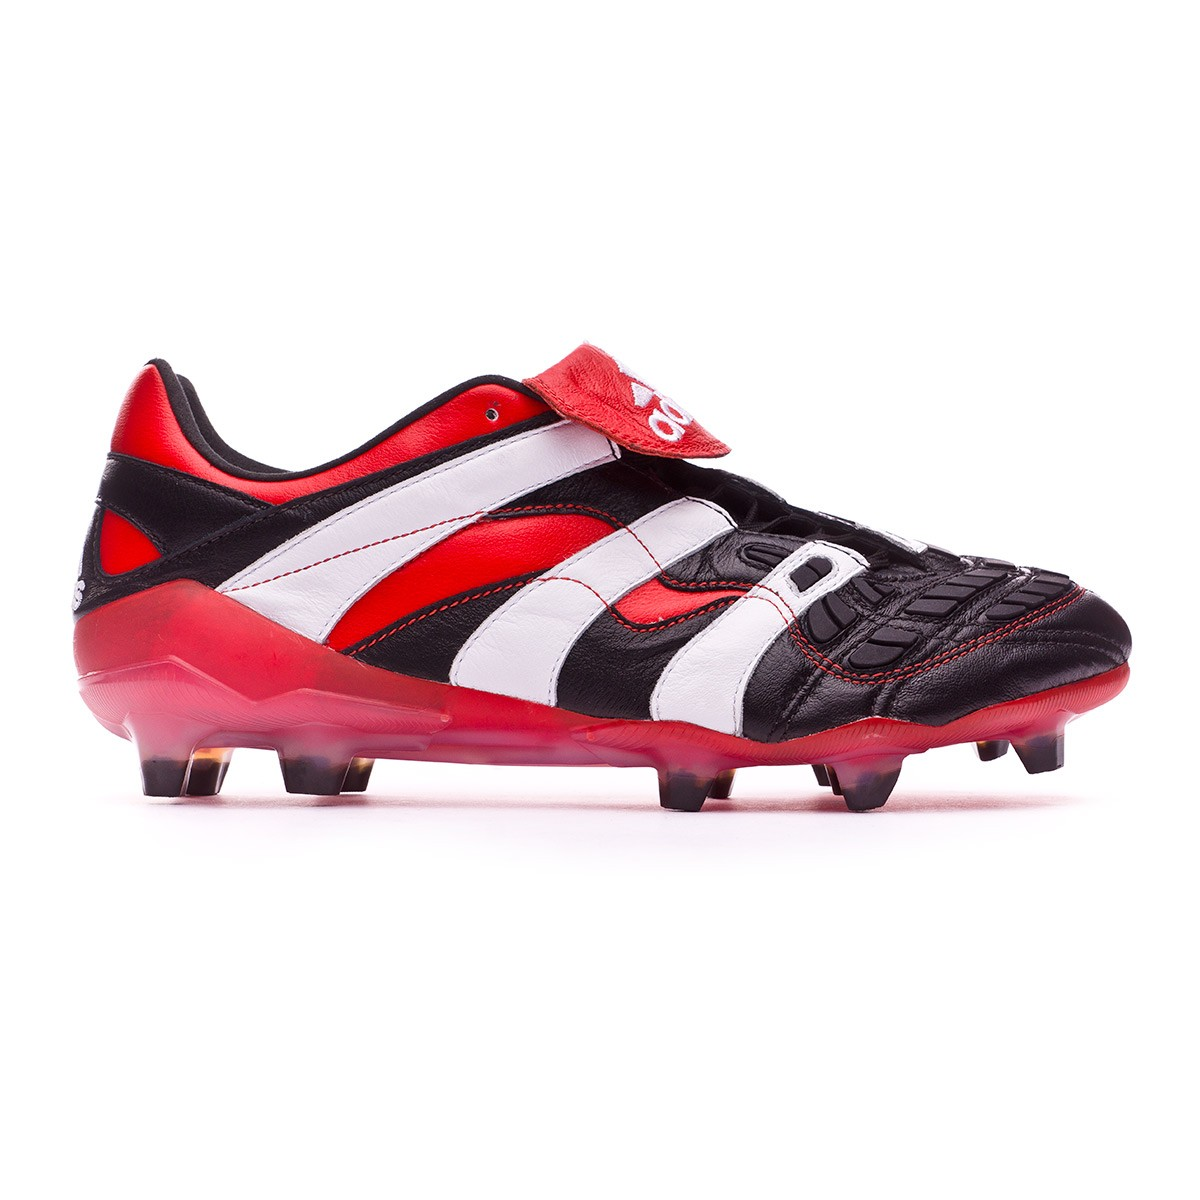 Bota de fútbol adidas Predator Accelerator FG Black - Soloporteros es ahora  Fútbol Emotion 6b32a4829a752